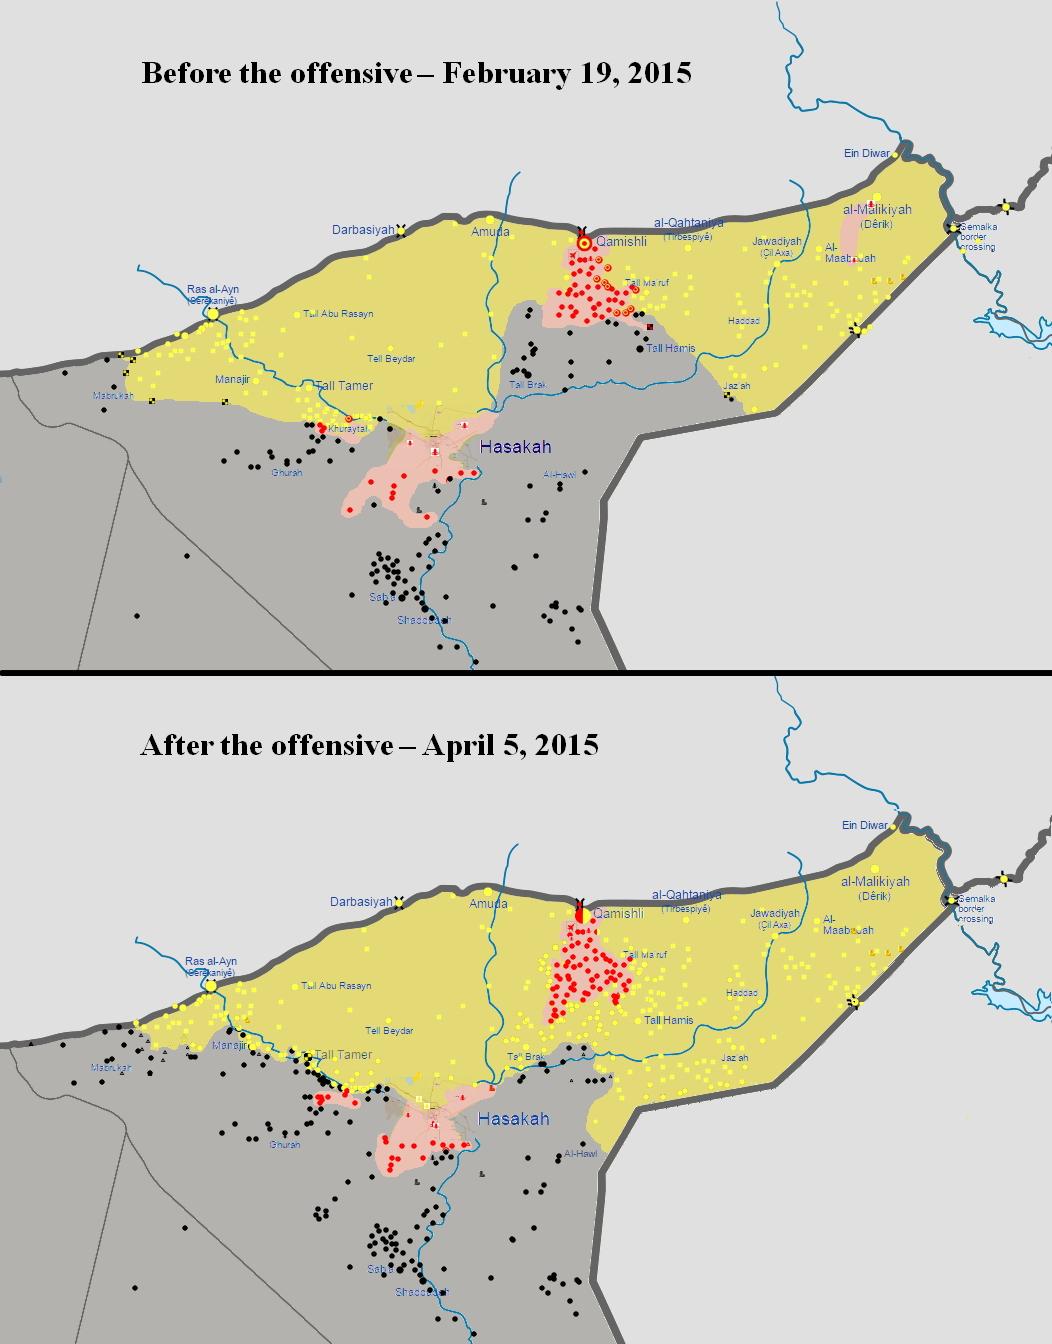 Al-Hasakah_offensive_territorial_changes_map